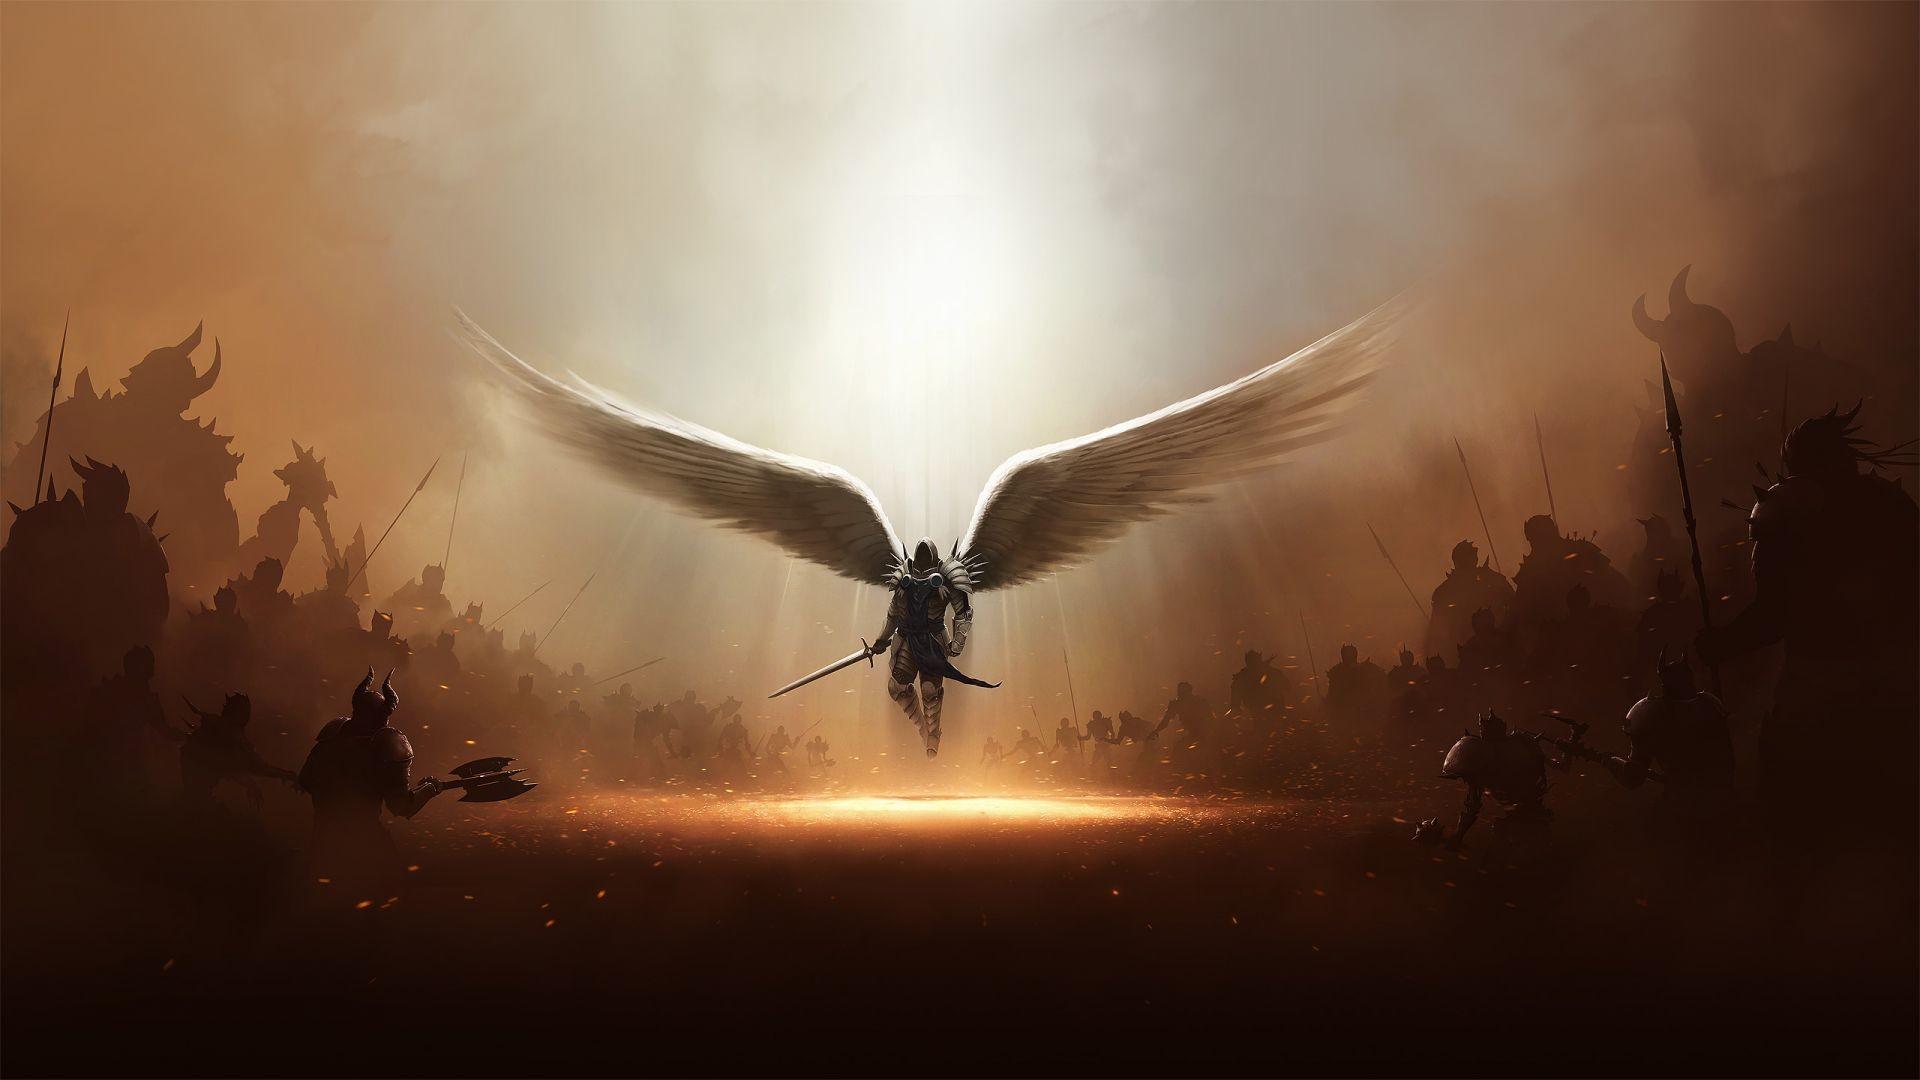 Tyrael Alone War Fighting Angel Demons Hell Heaven Diablo Game